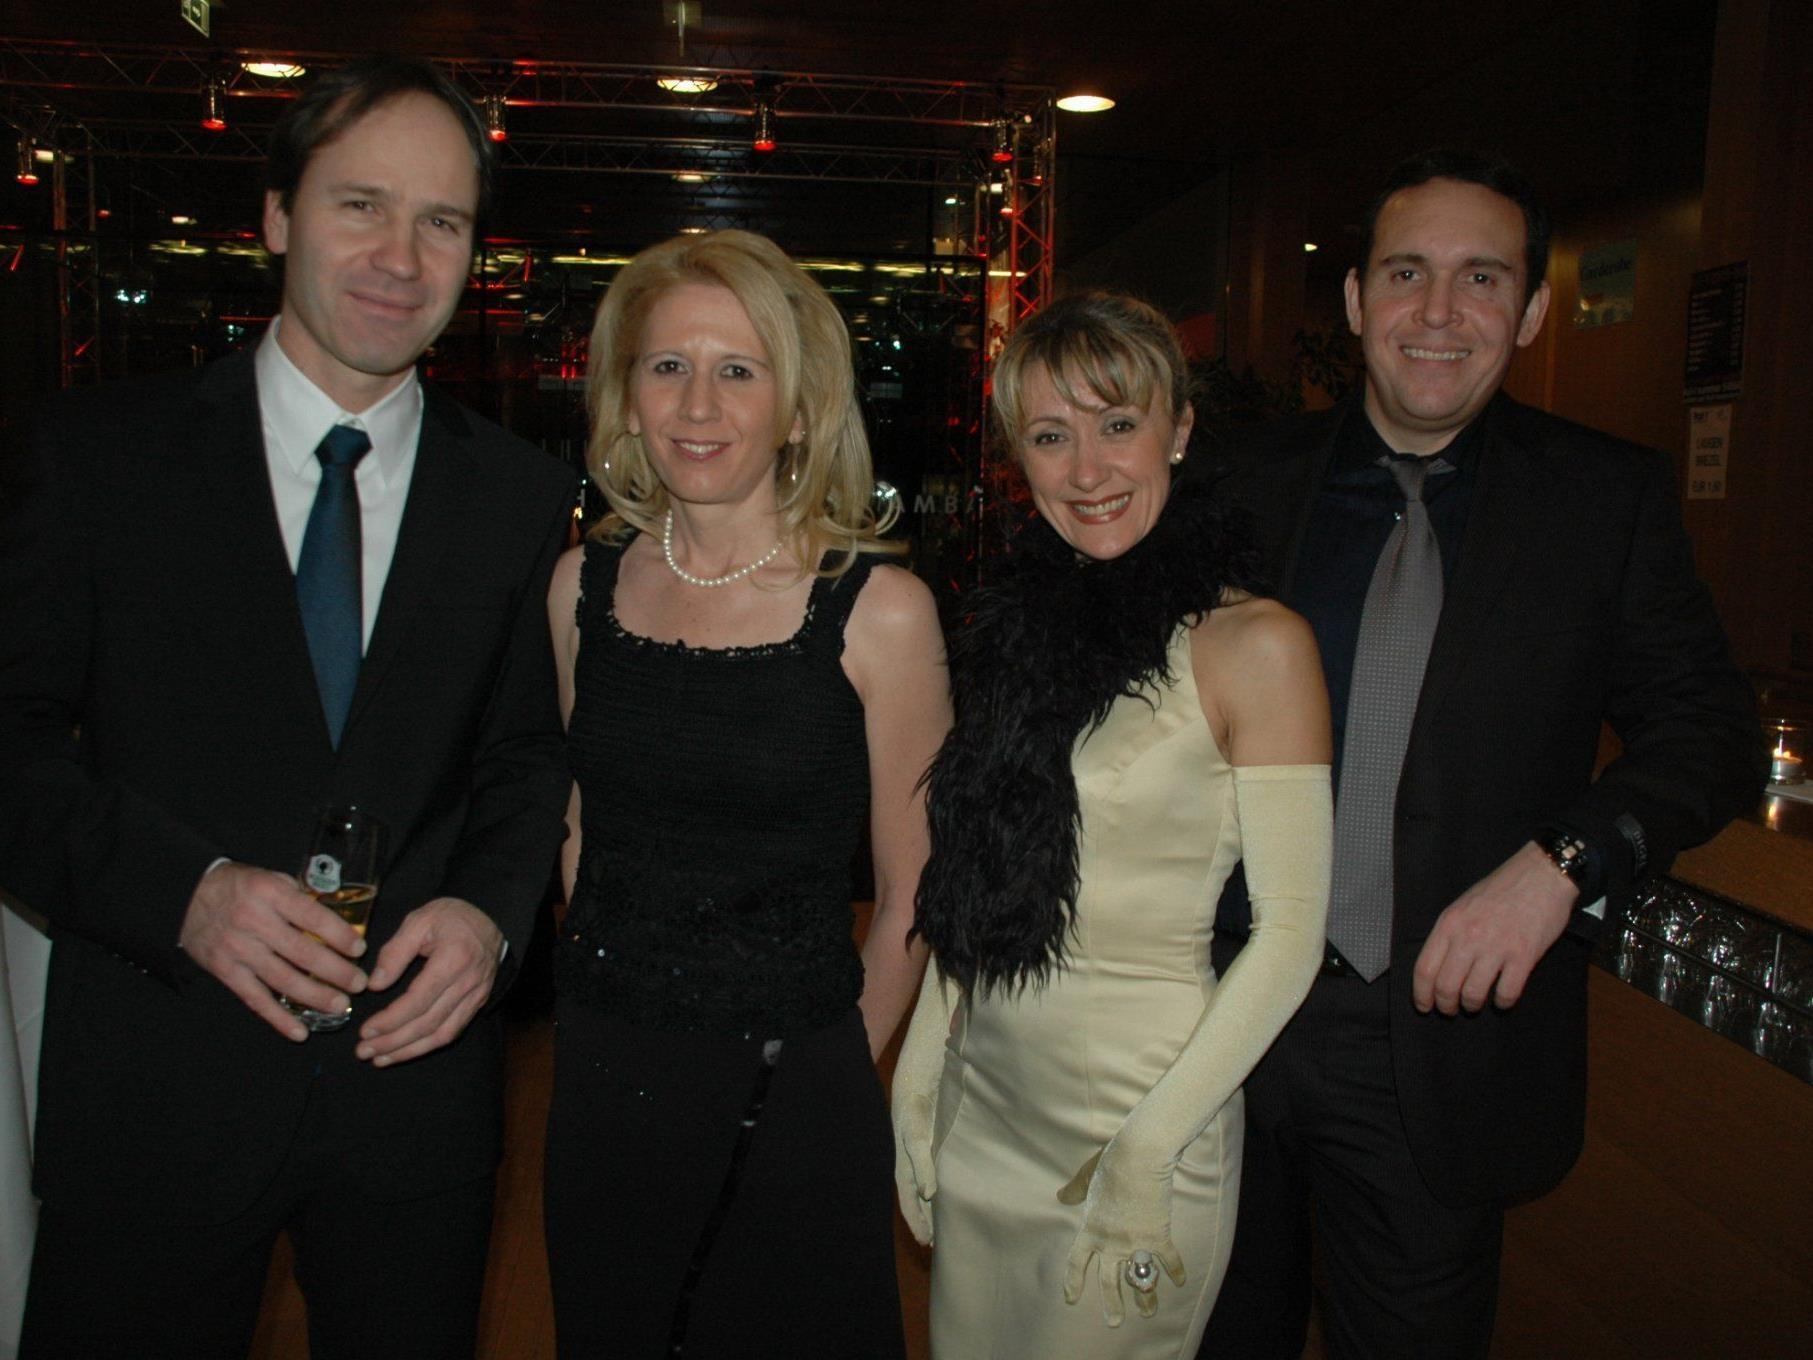 In Ballstimmung: Harald Türtscher, Manuela Lampert, Slava Novkovic & Roman Rebholz